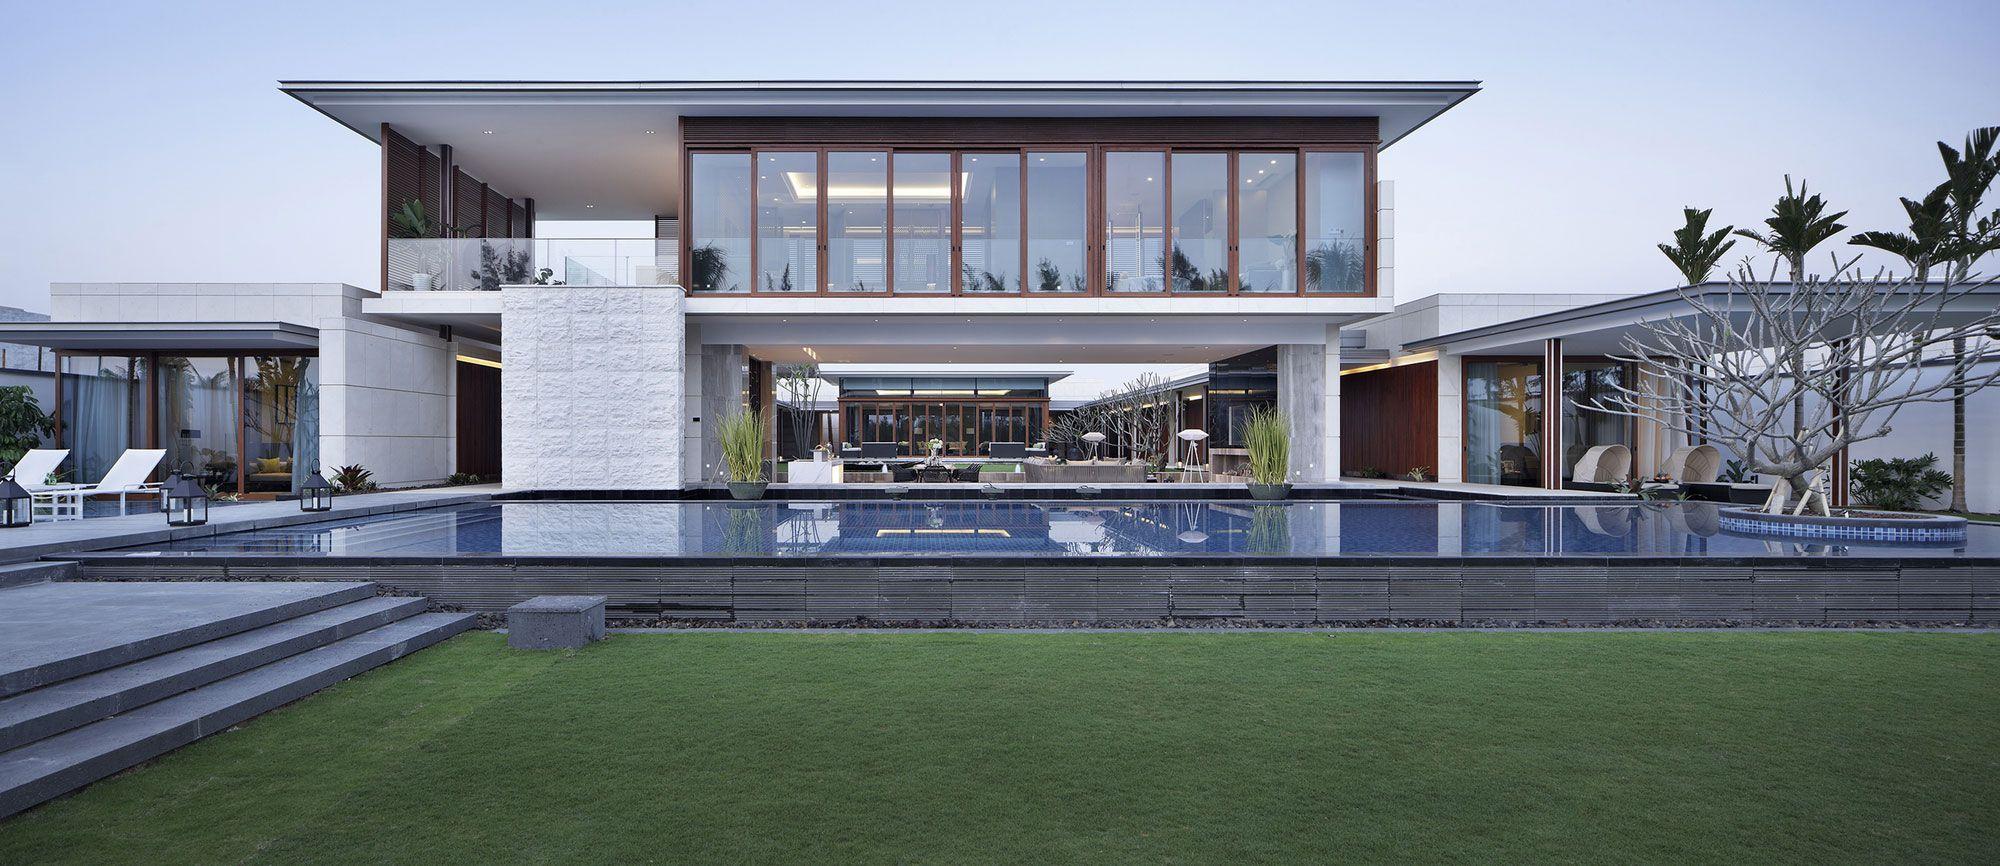 The Most Minimalist Villa In China